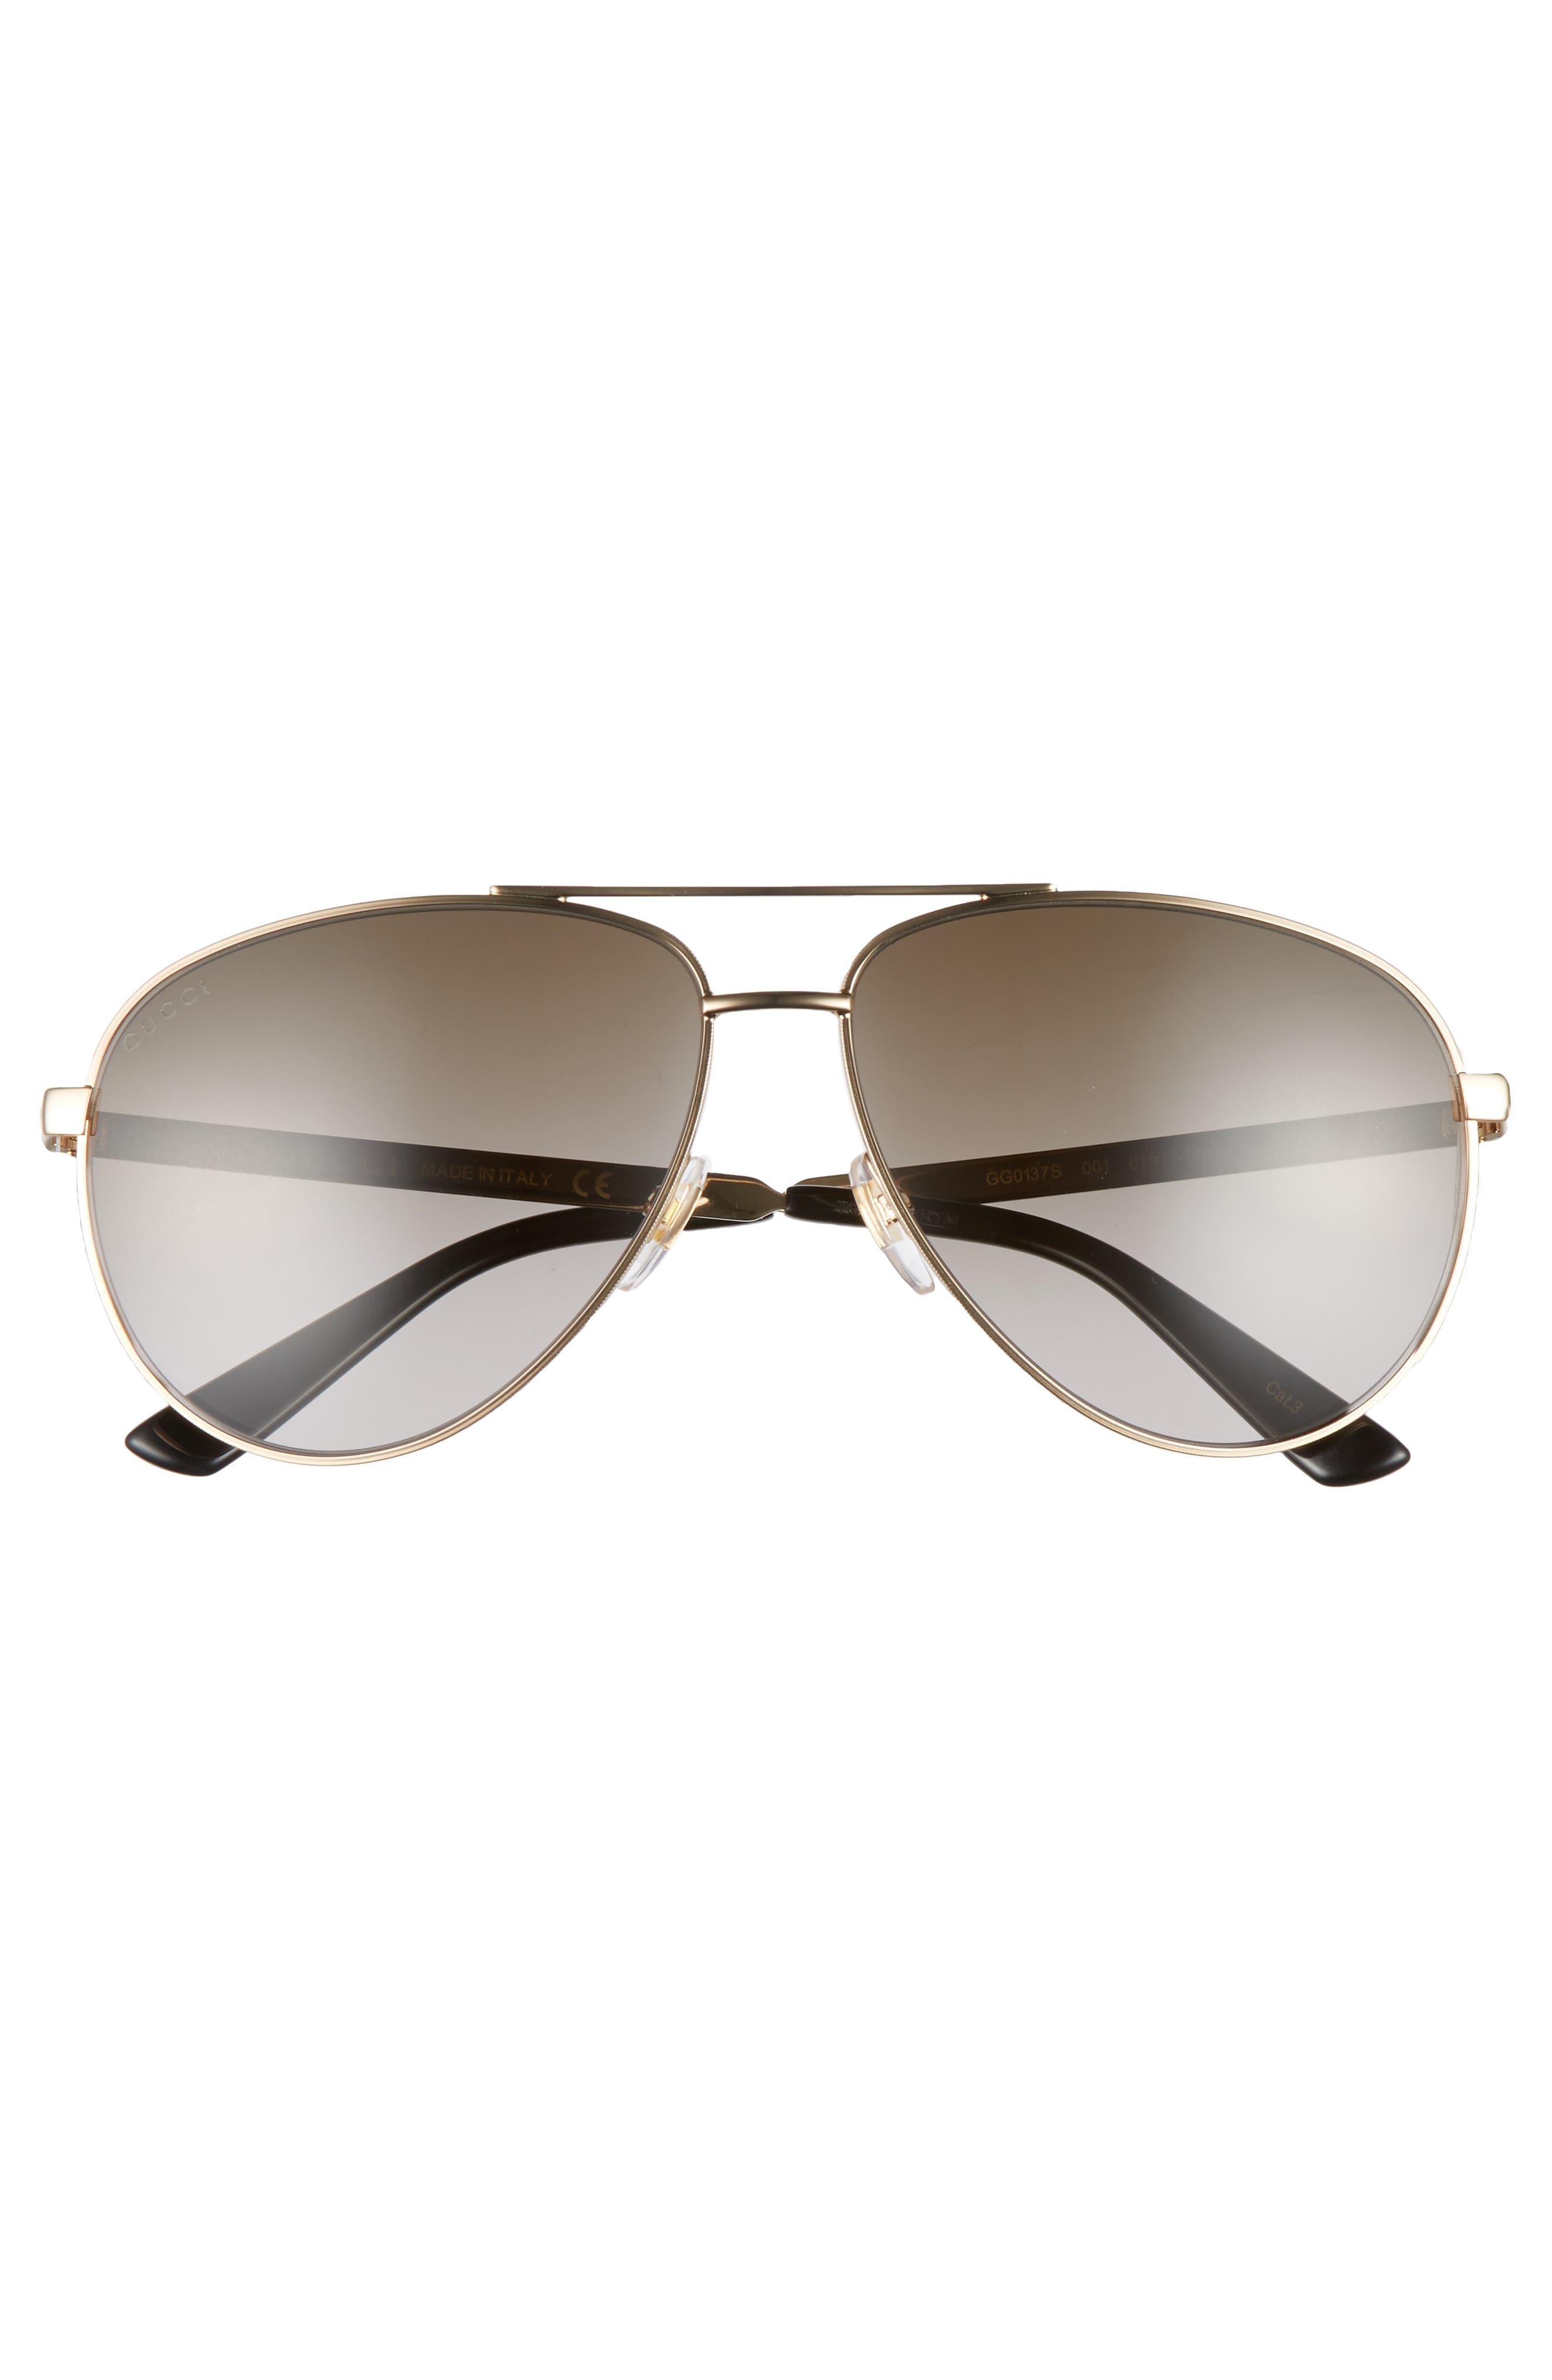 61mm Aviator Sunglasses,                             Alternate thumbnail 2, color,                             GOLD/BROWN